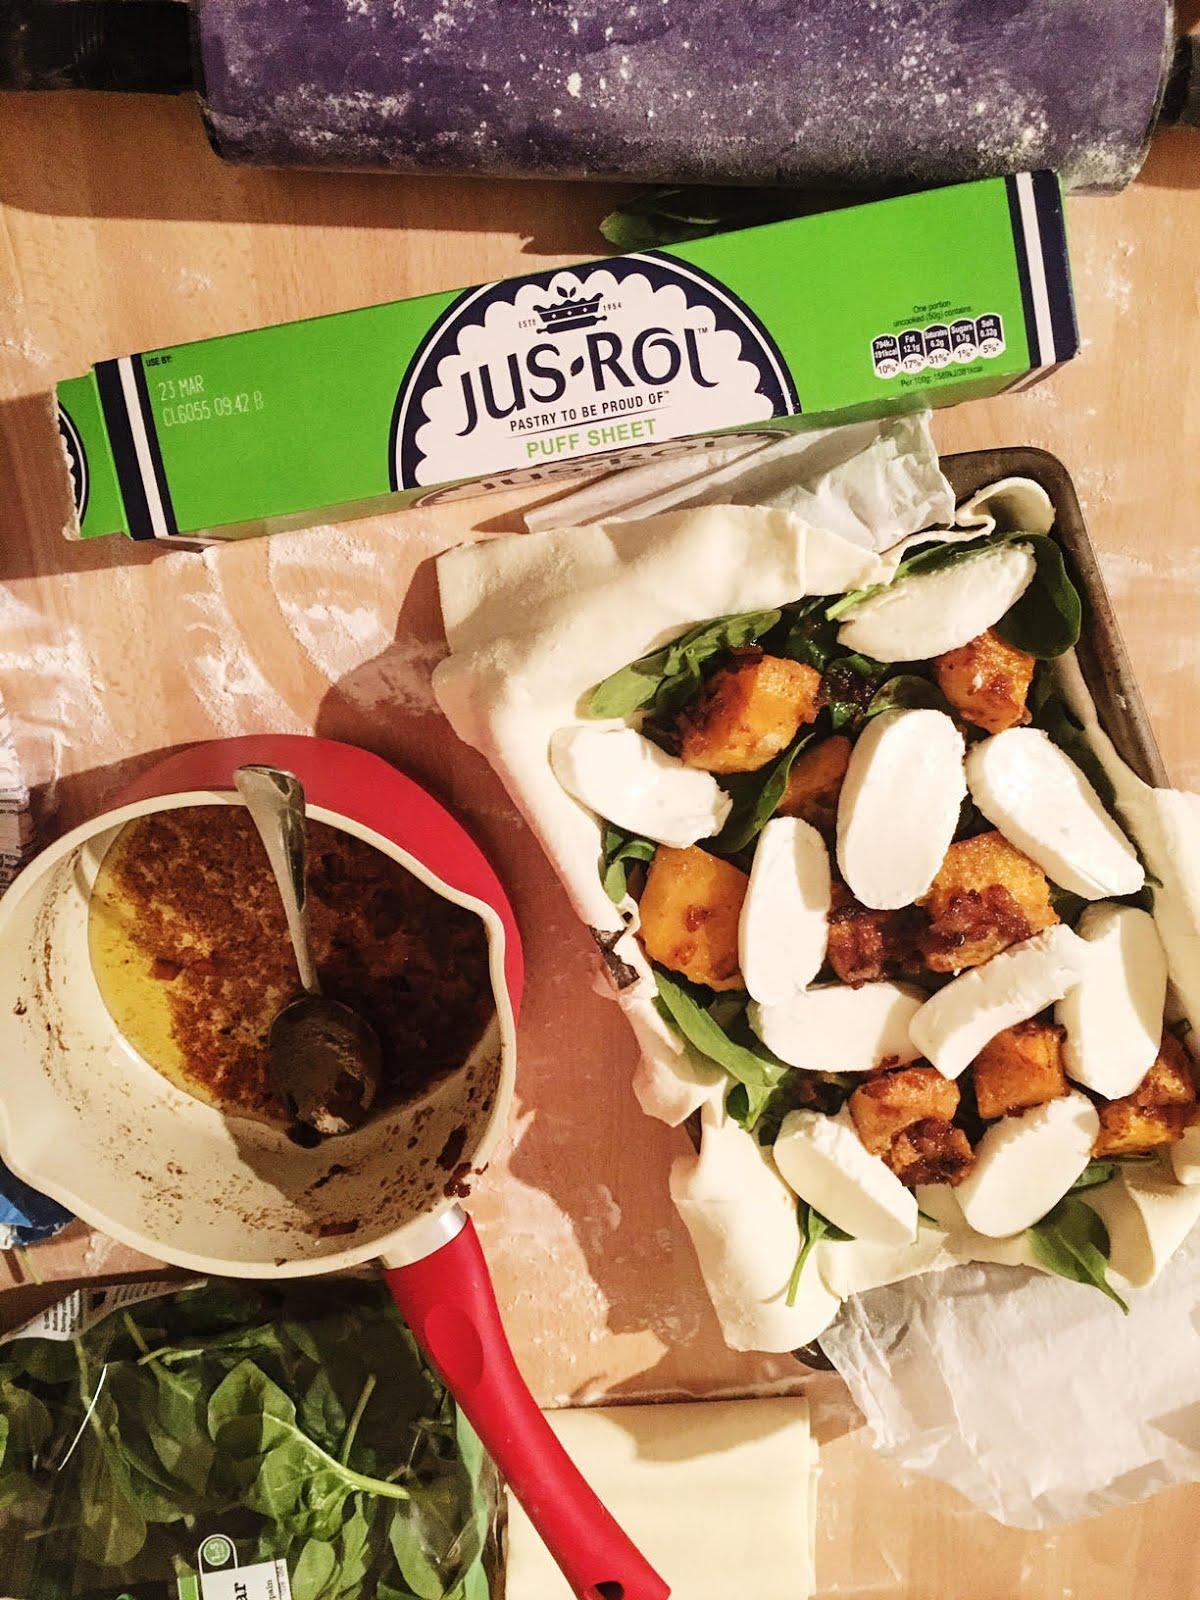 Veggie Easter Pie Recipe #JusRoll